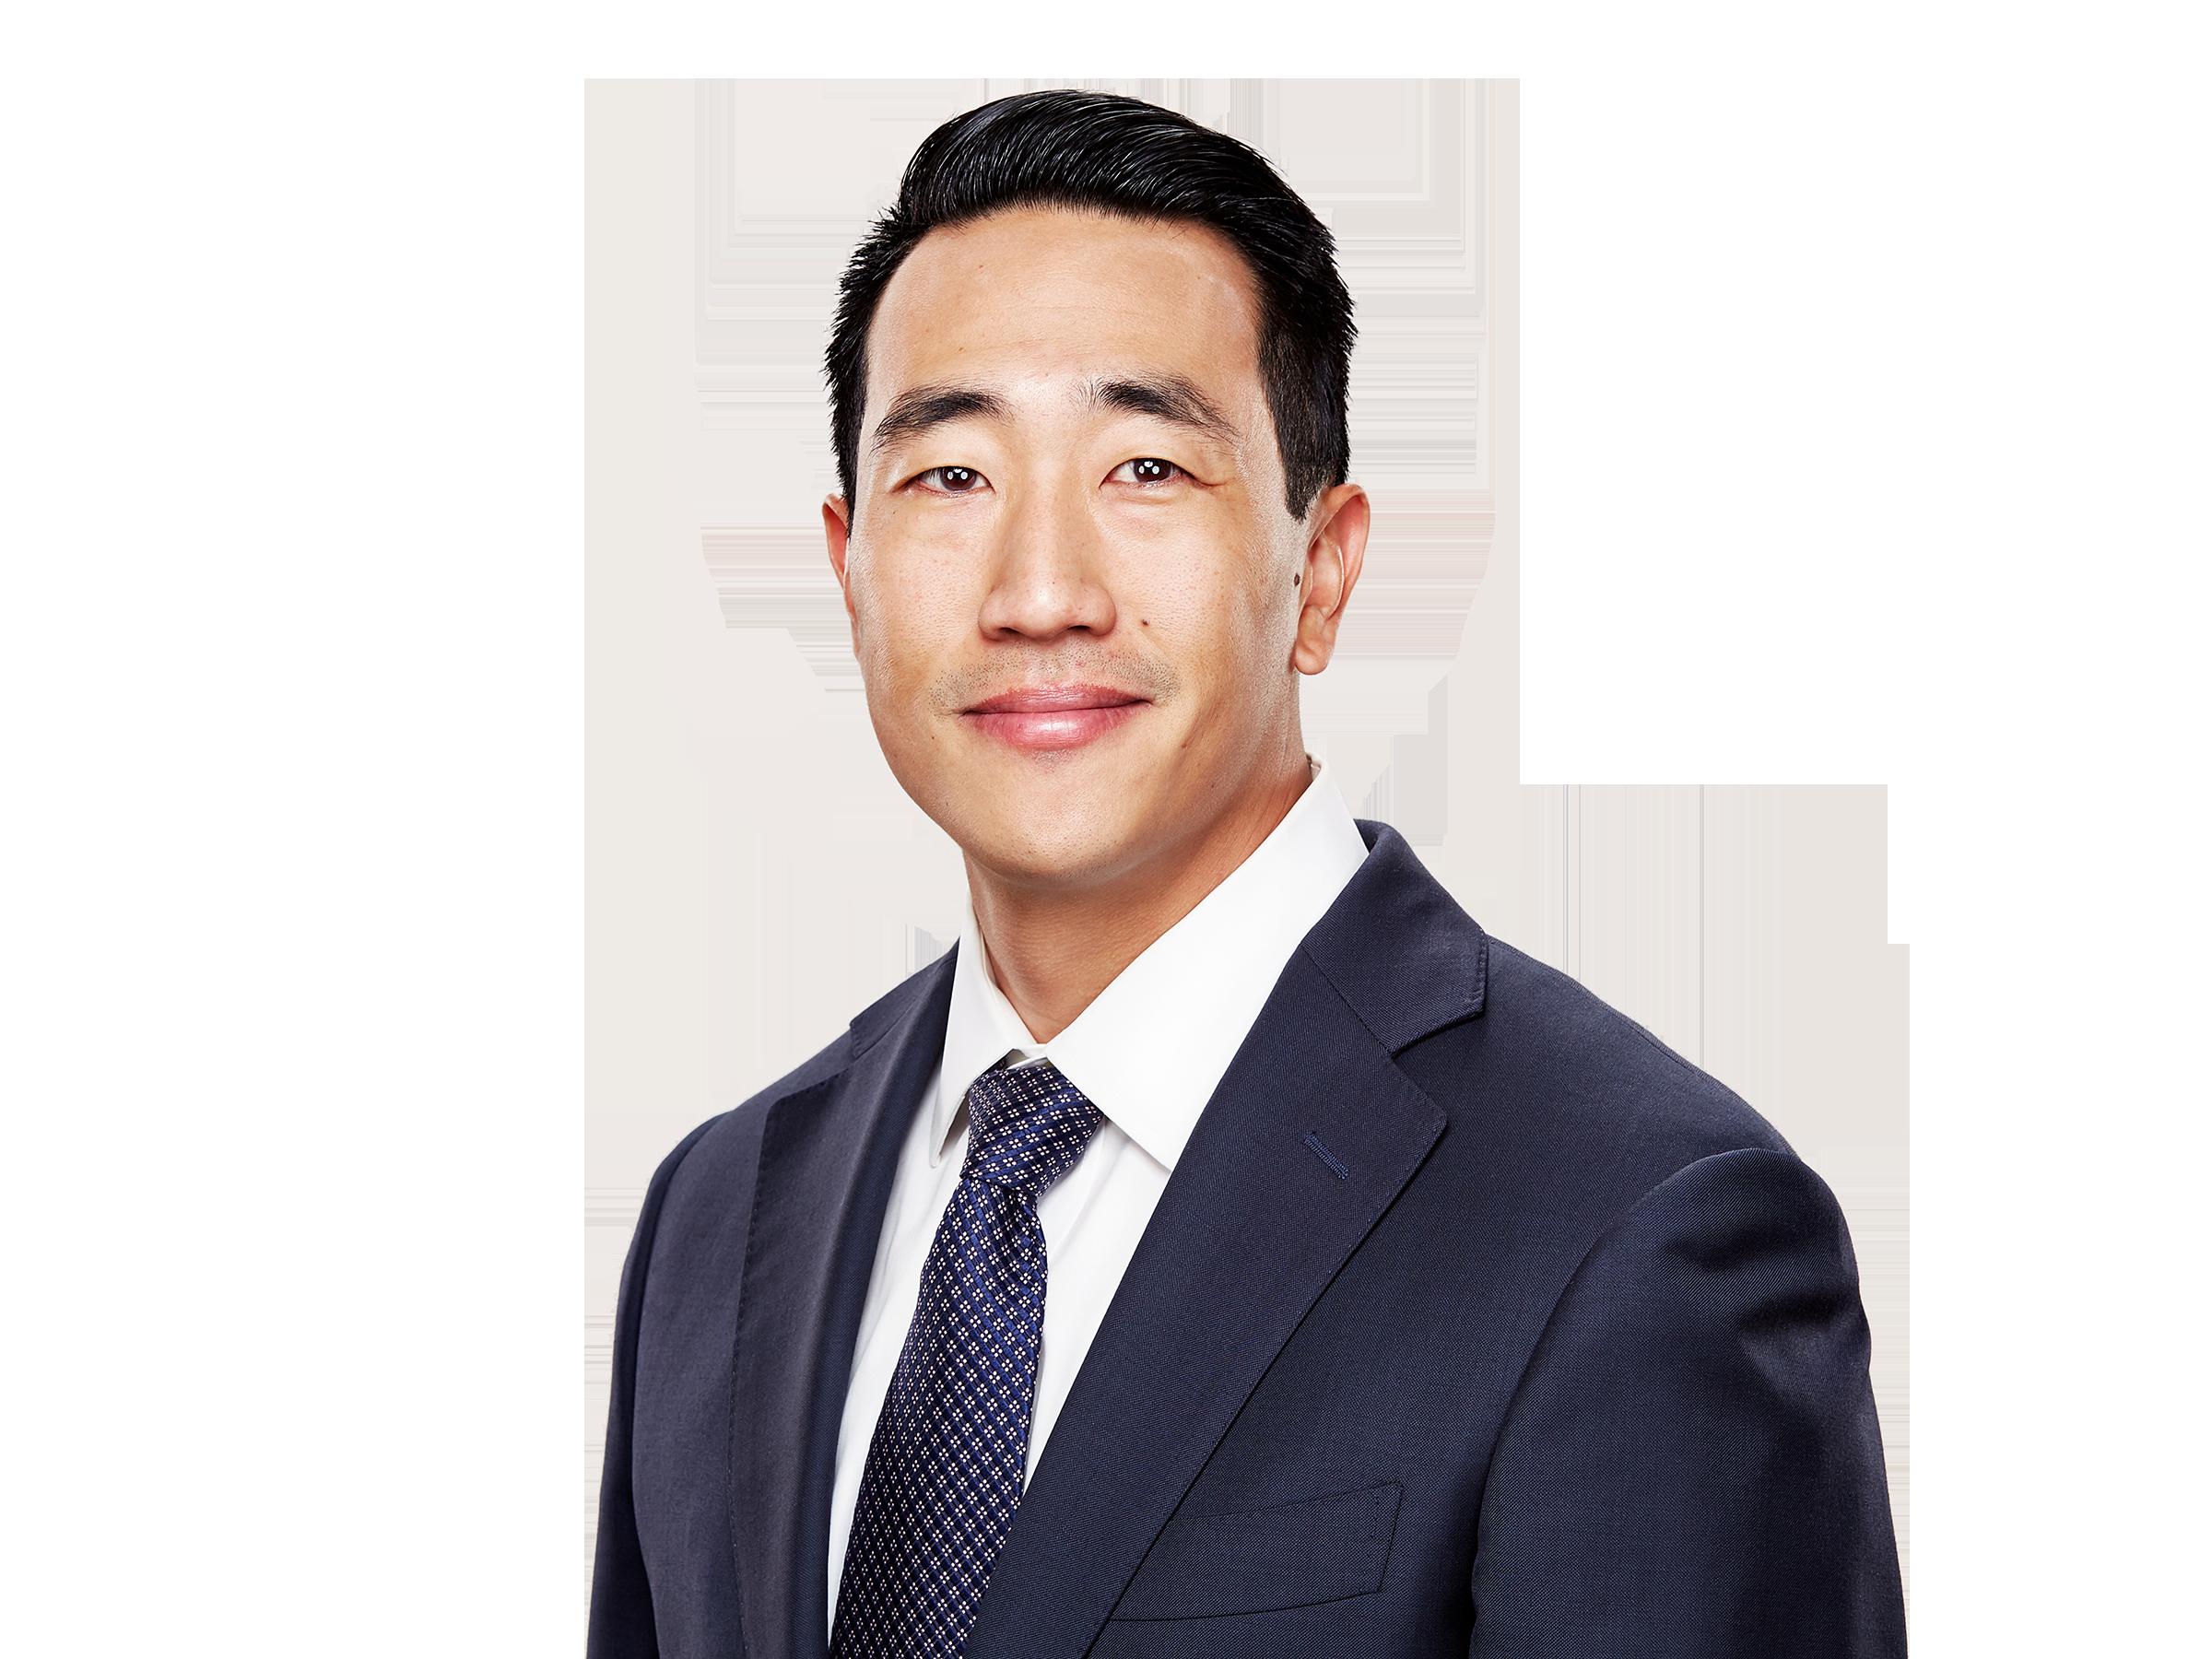 Daniel_Chung